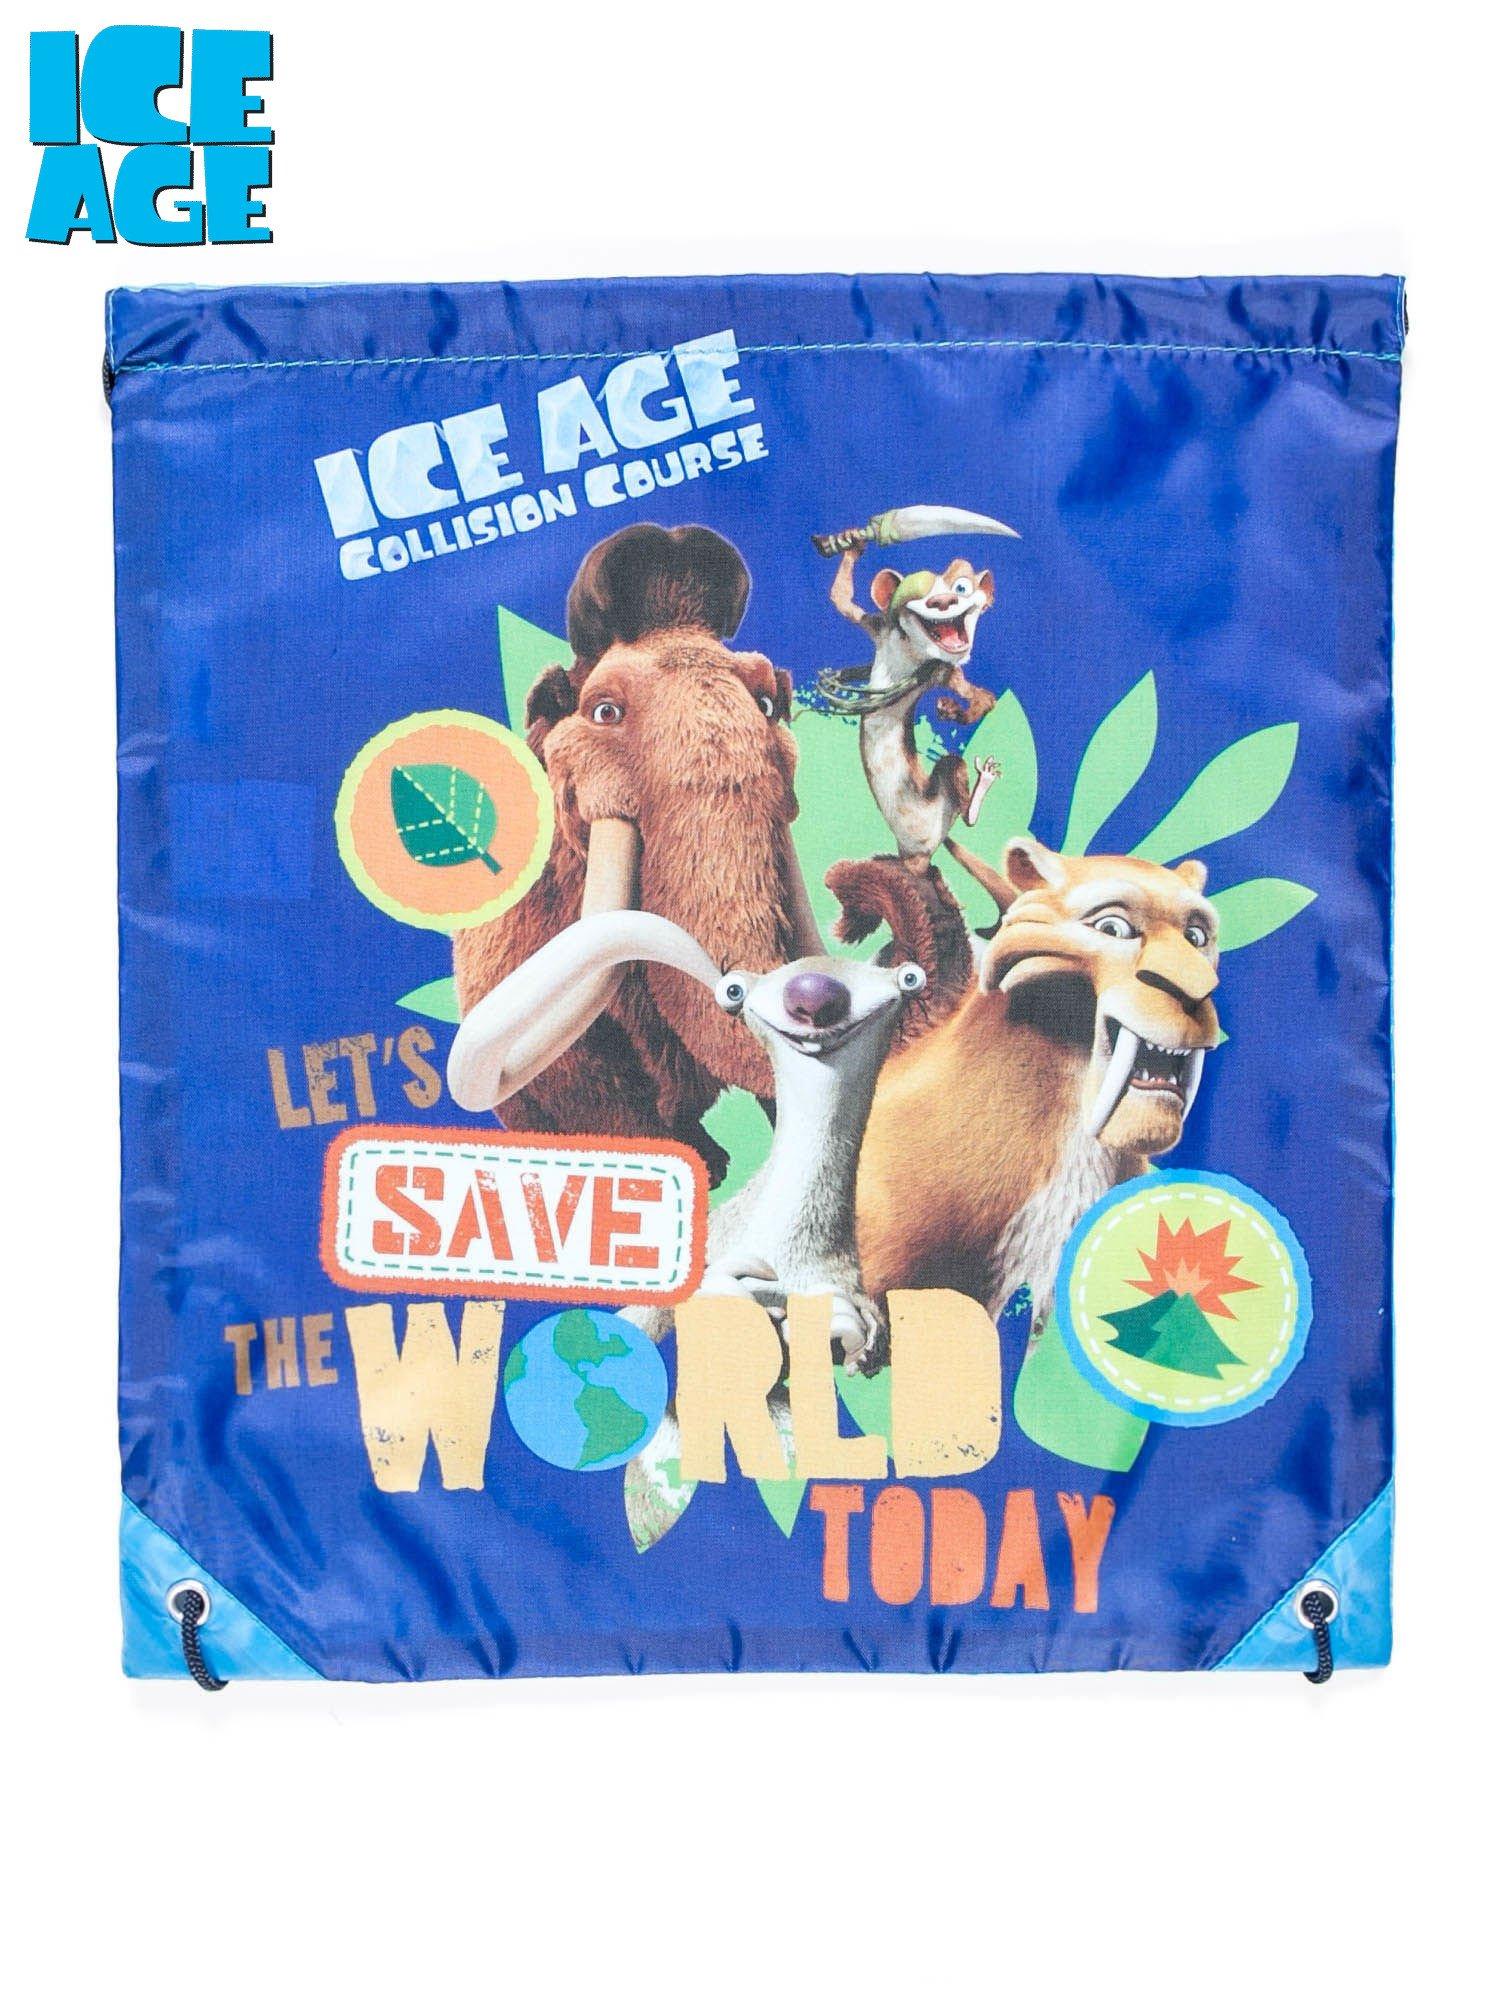 Plecak typu worek z motywem ICE AGE